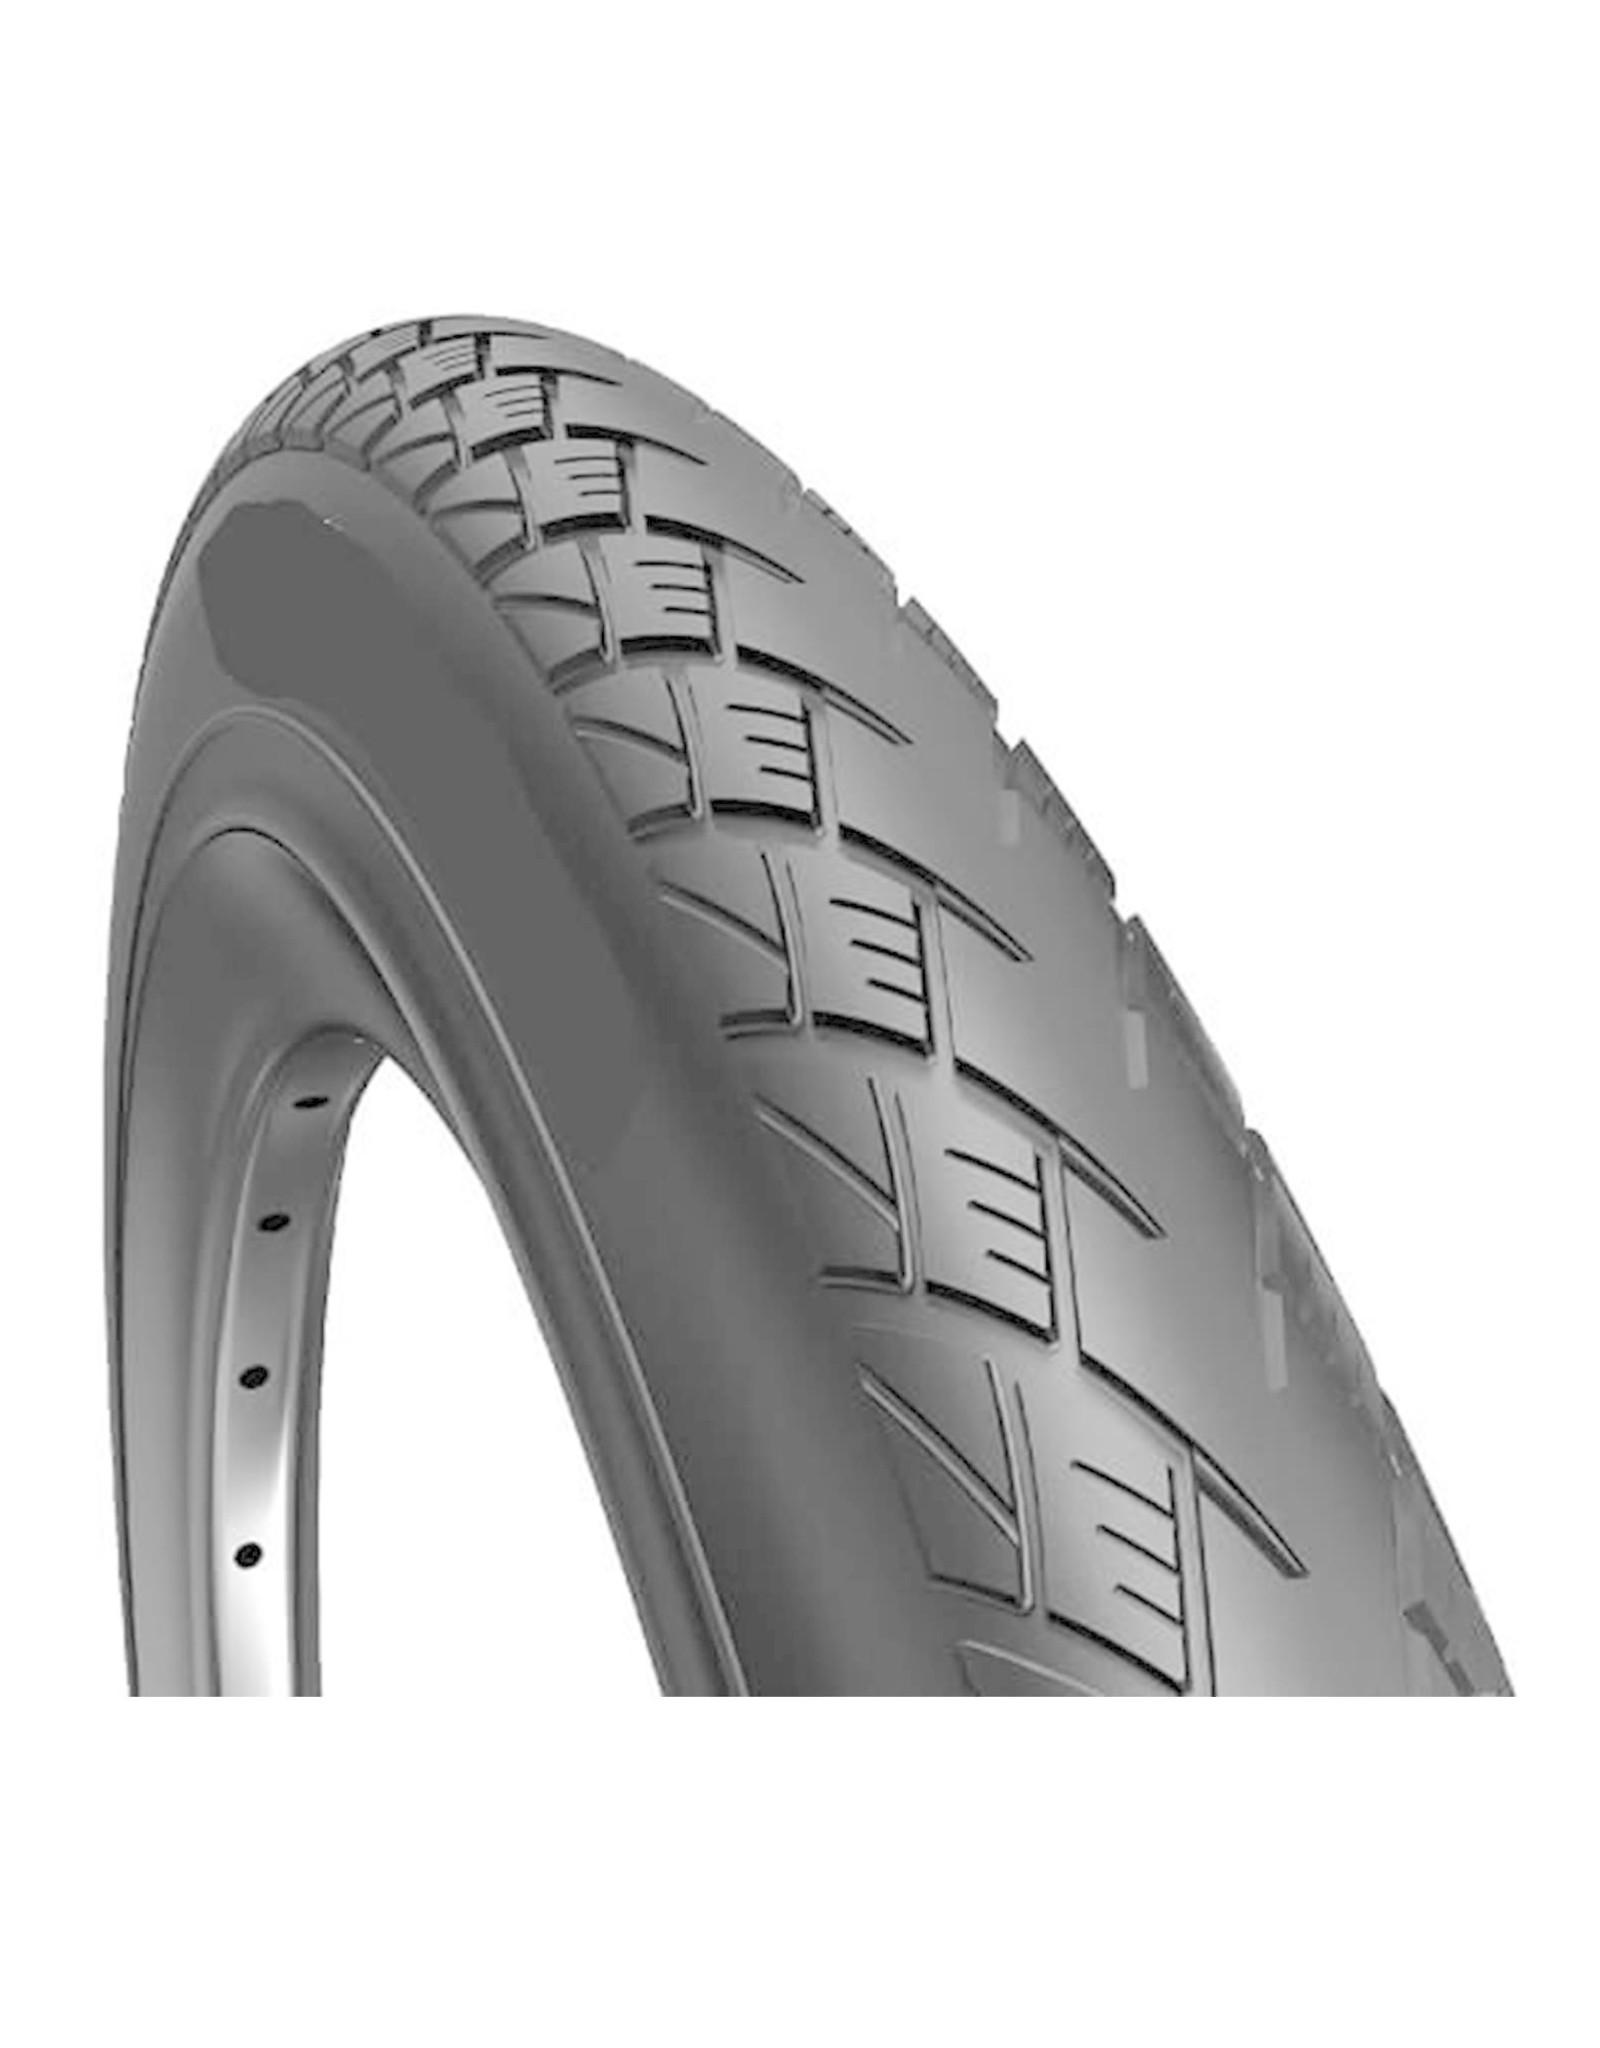 Rocket City Runner 700 X 40 PG Tyre